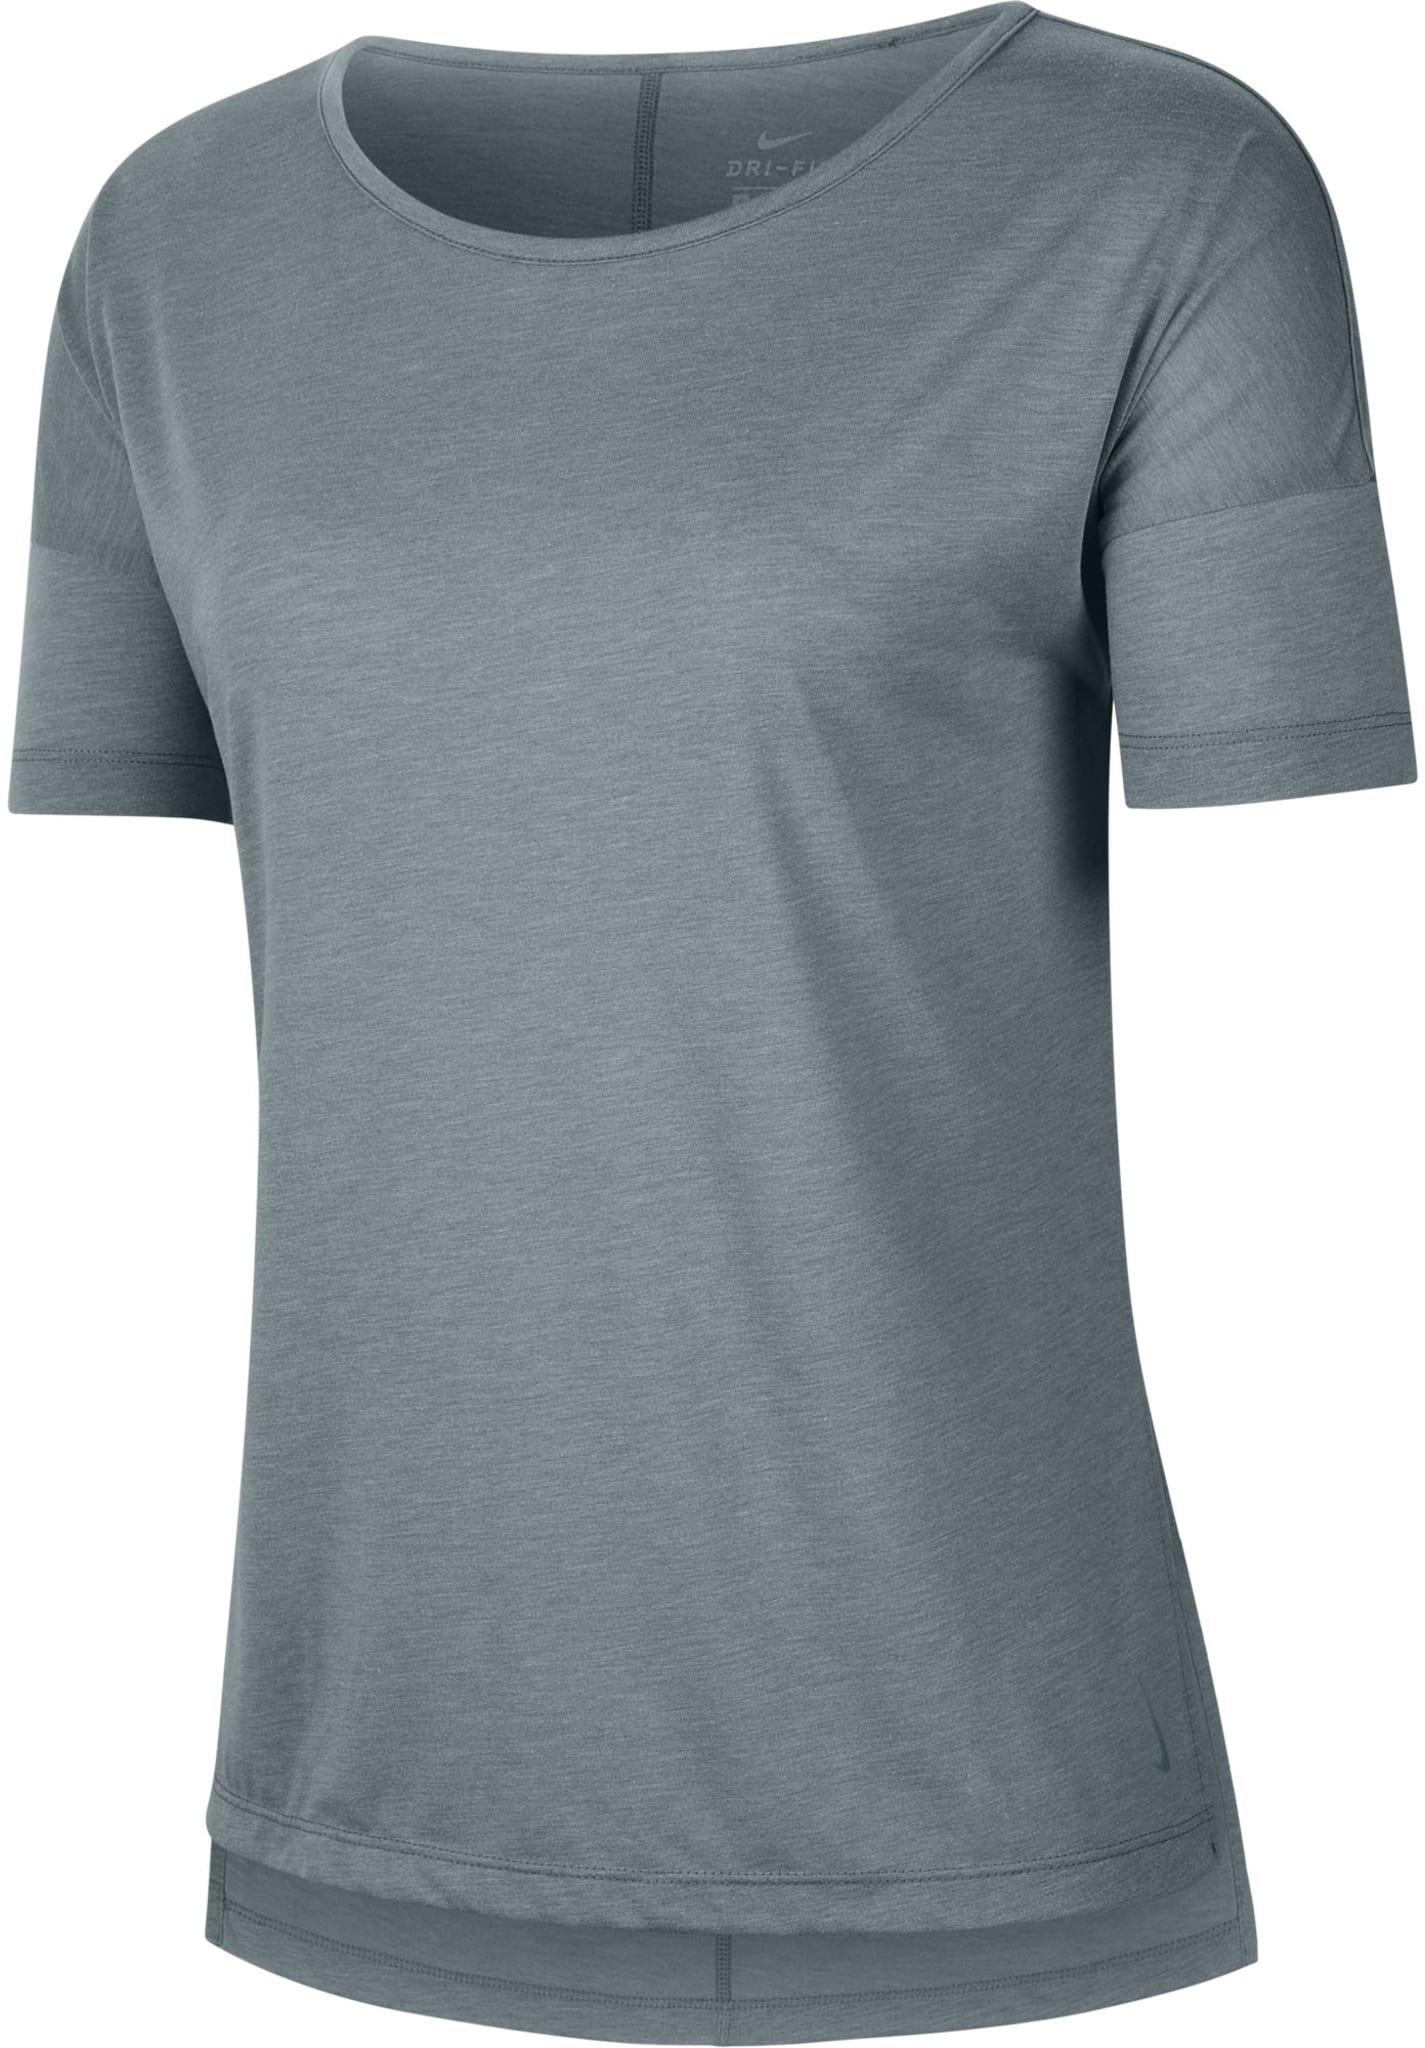 Yoga Short-Sleeve W